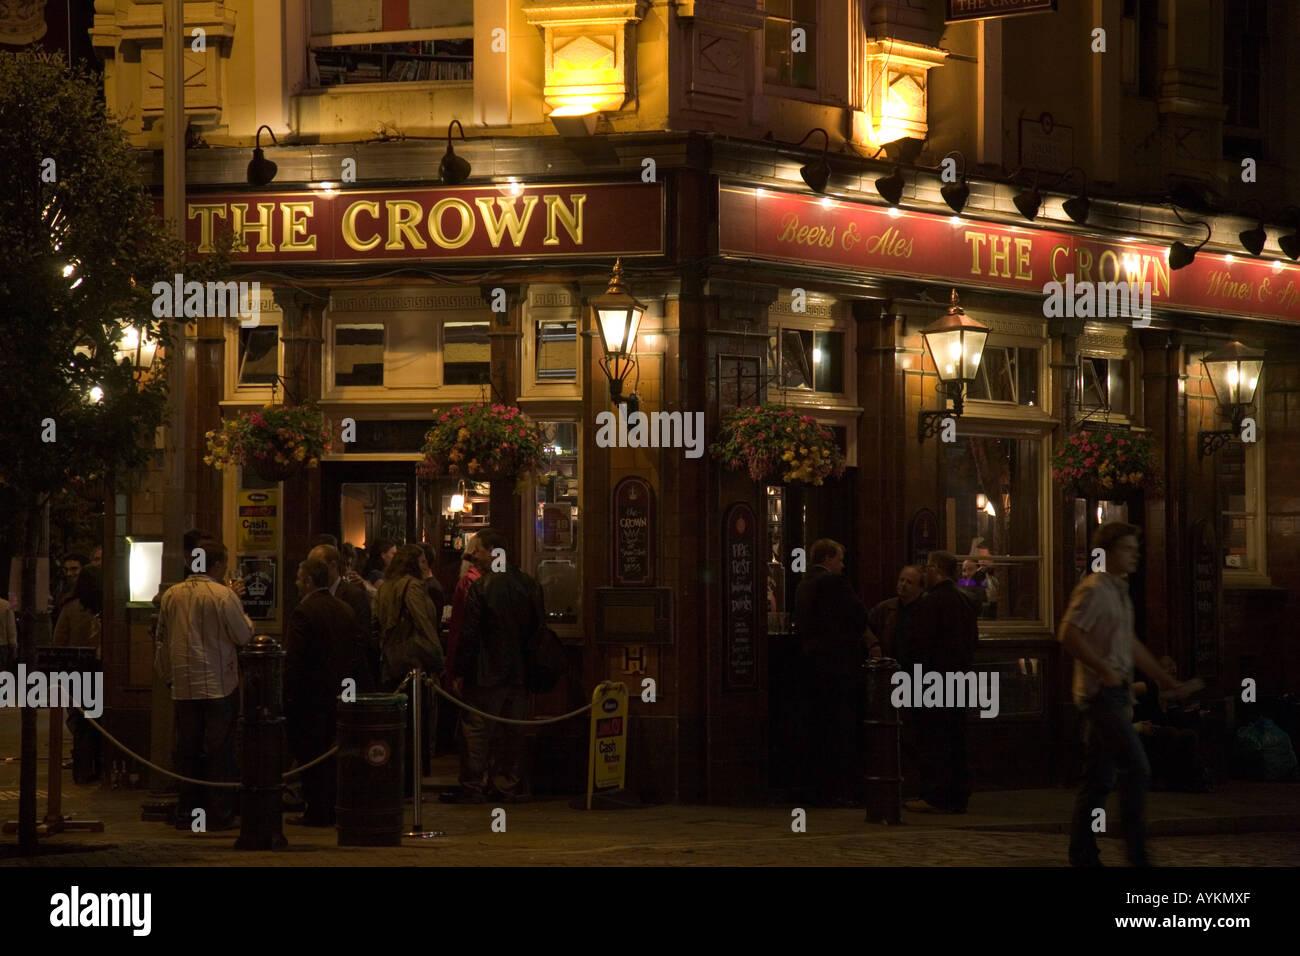 Pub In Covent Garden London Stock Photos & Pub In Covent Garden ...